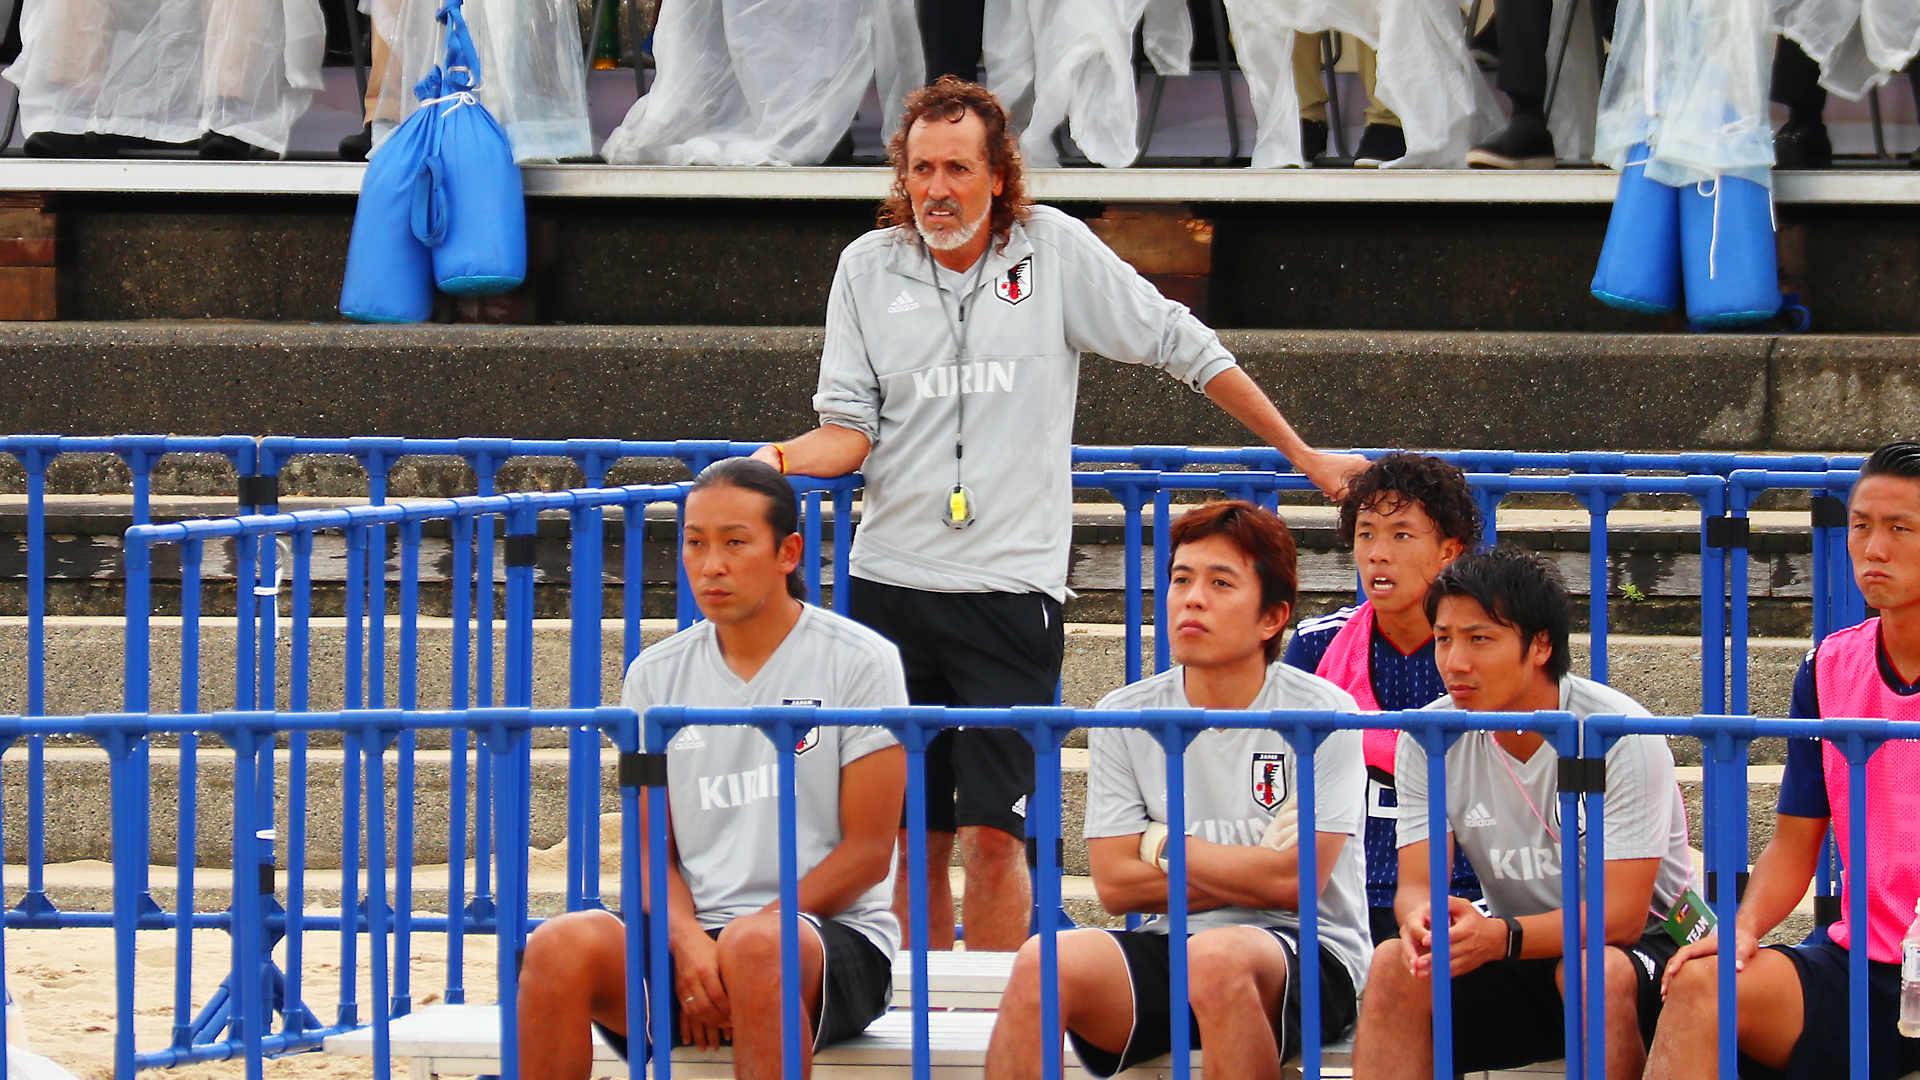 ビーチサッカー国際親善大会2019 大蔵海岸公園 大蔵海岸海水浴場